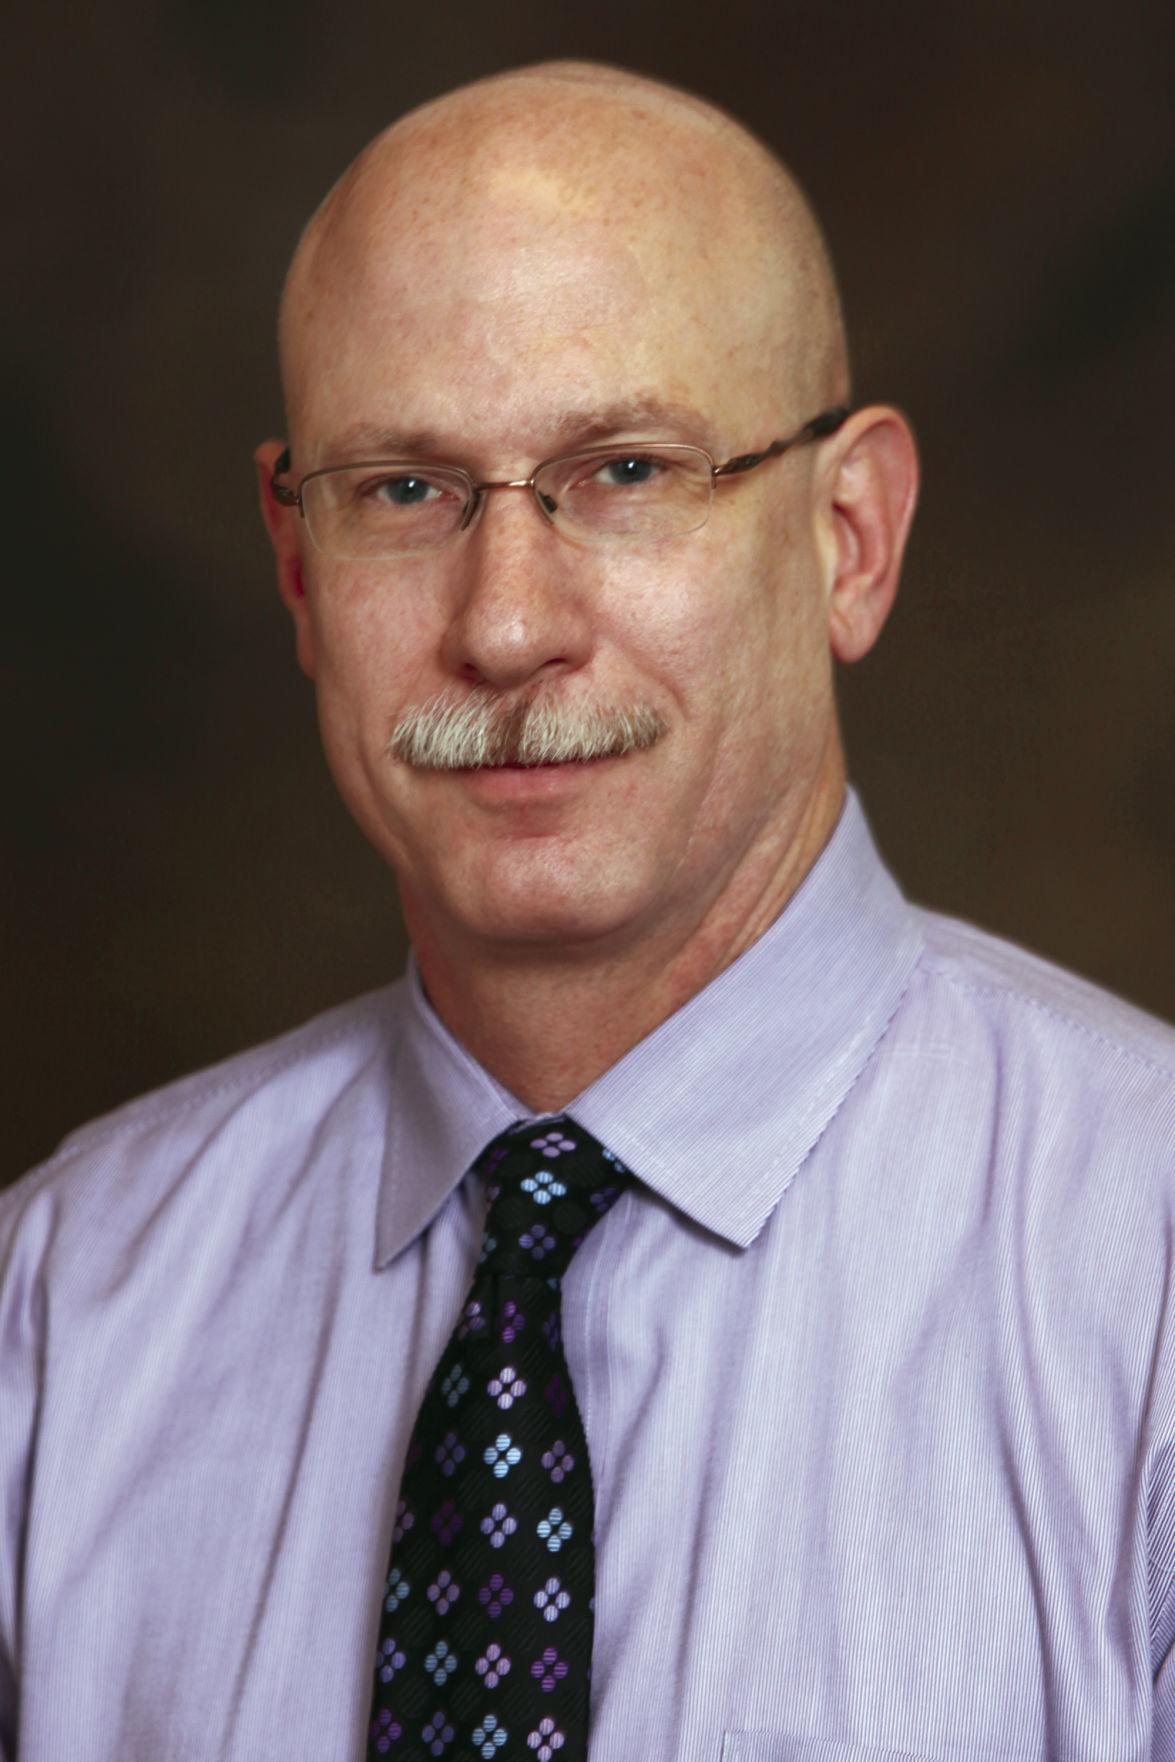 Jeffrey Zoelle